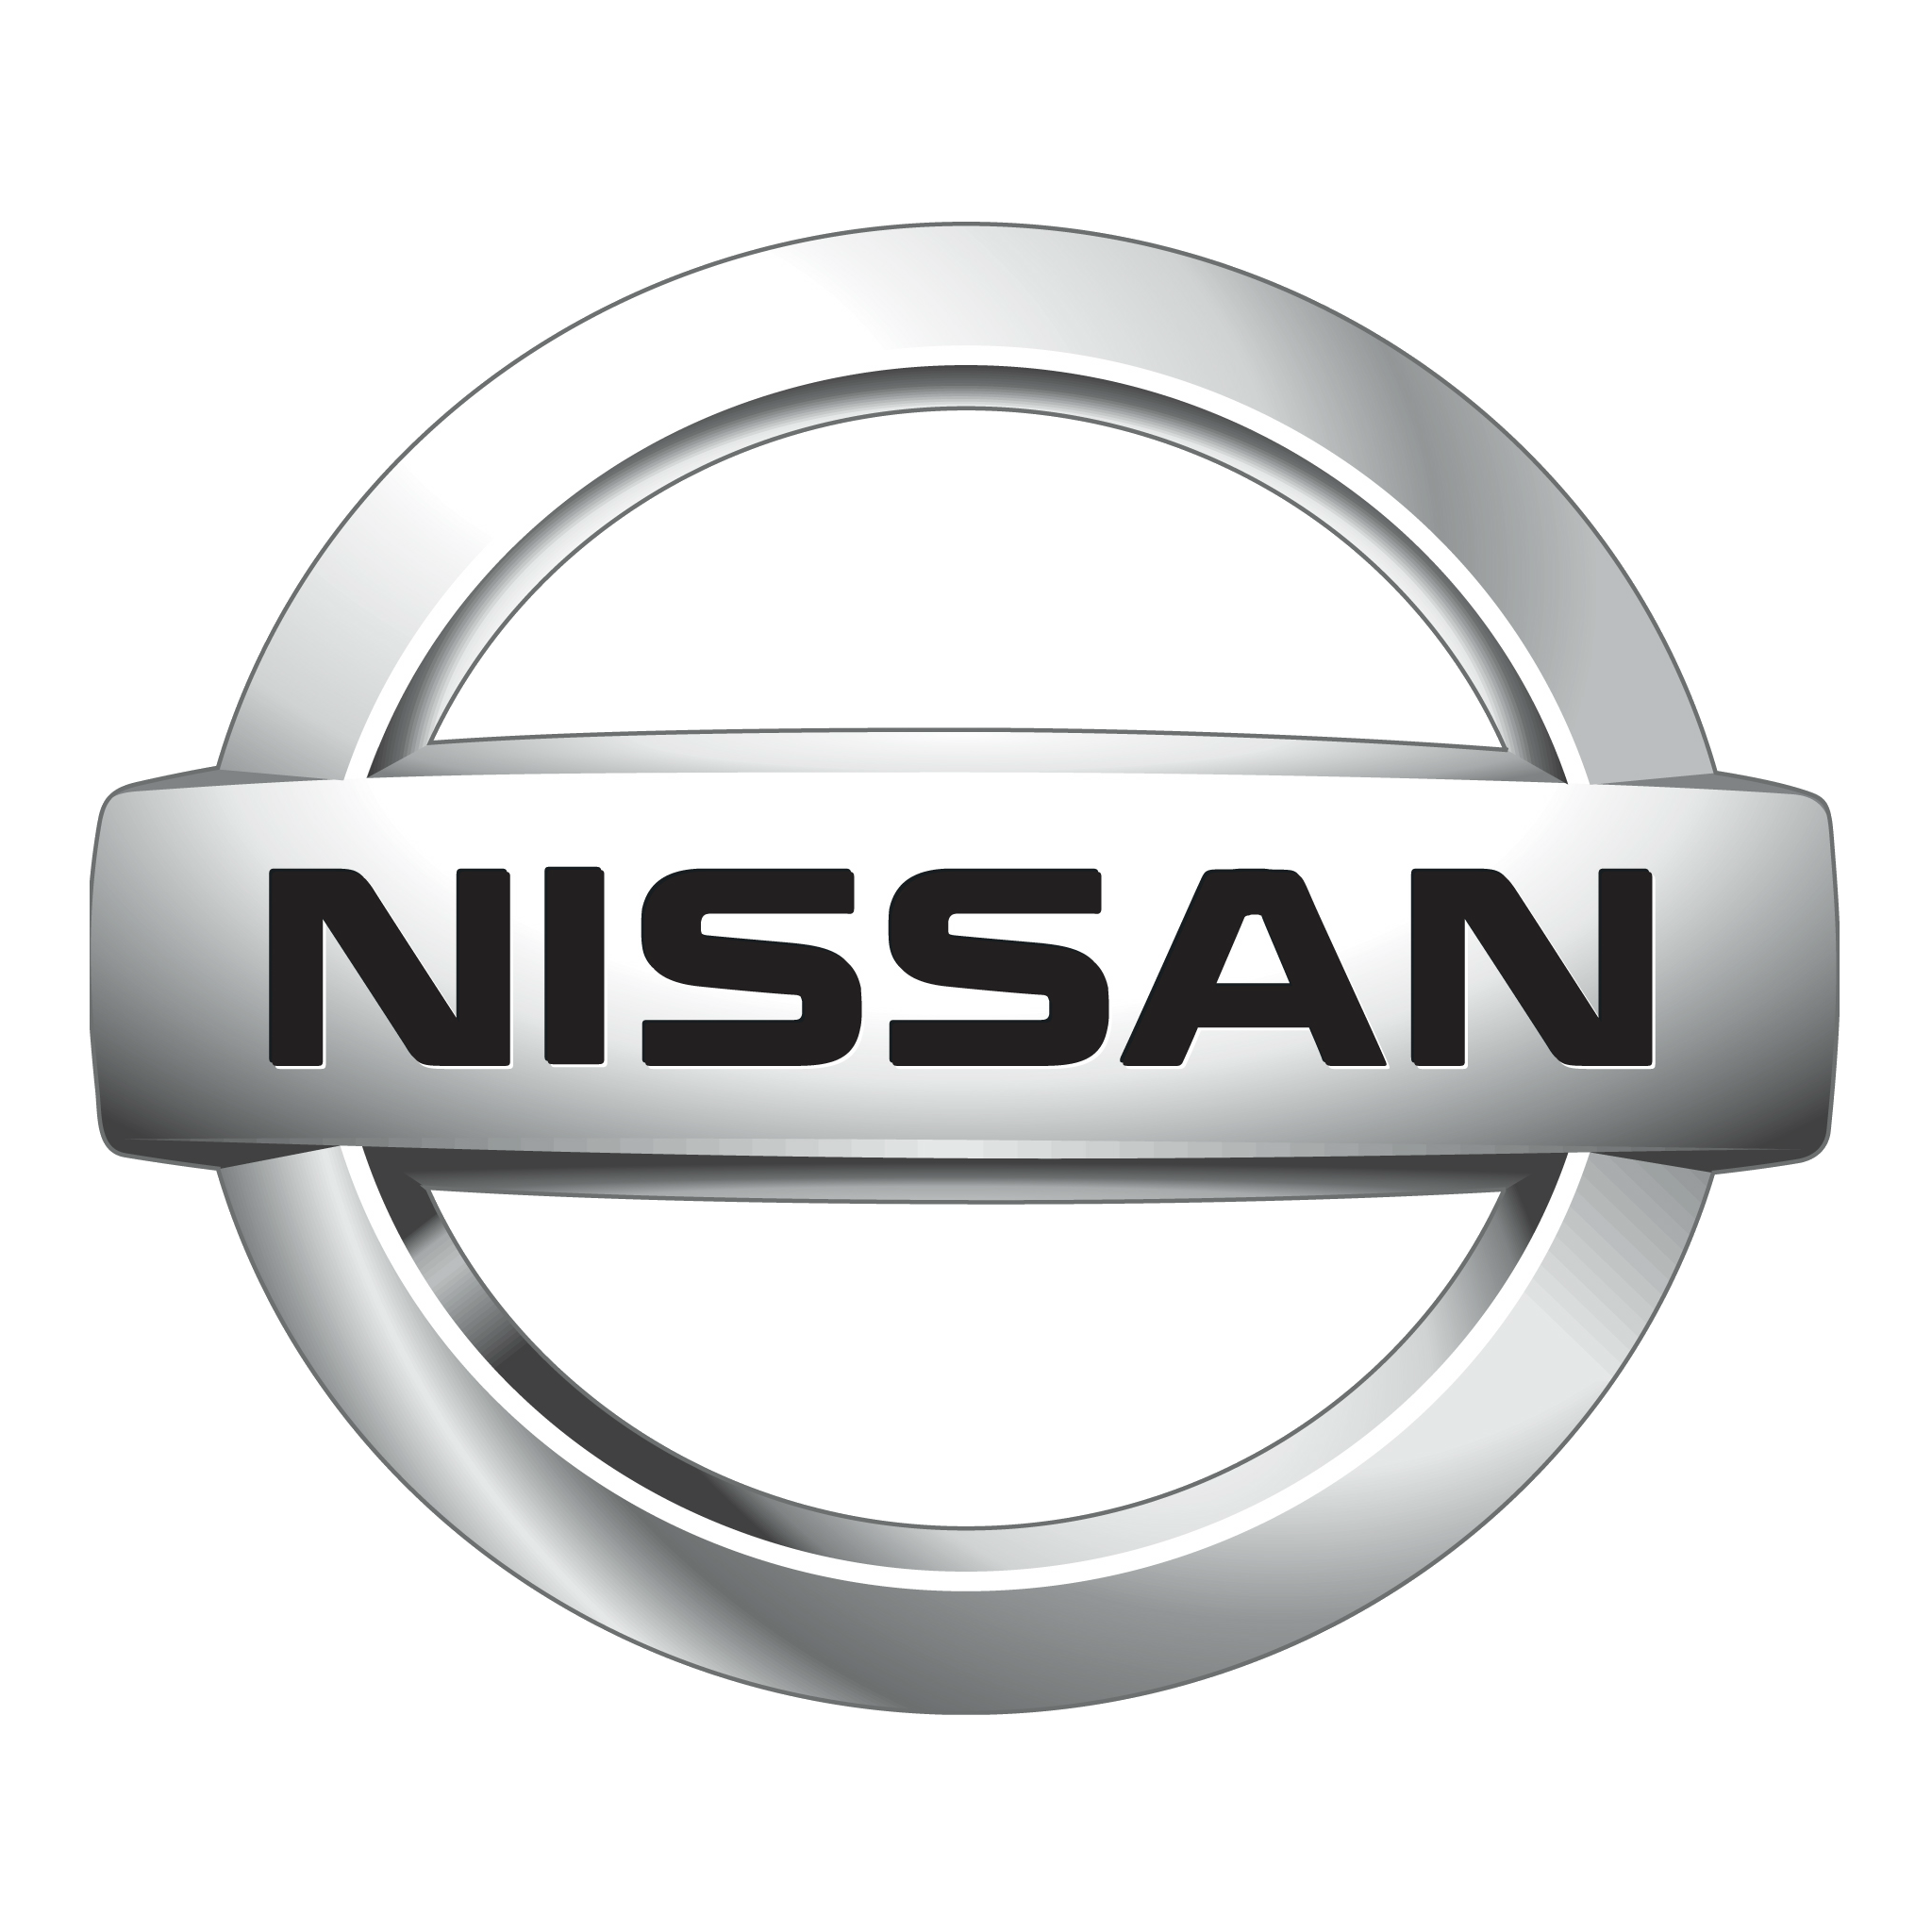 2048X2048 (Hd Png) - Nissan, Transparent background PNG HD thumbnail